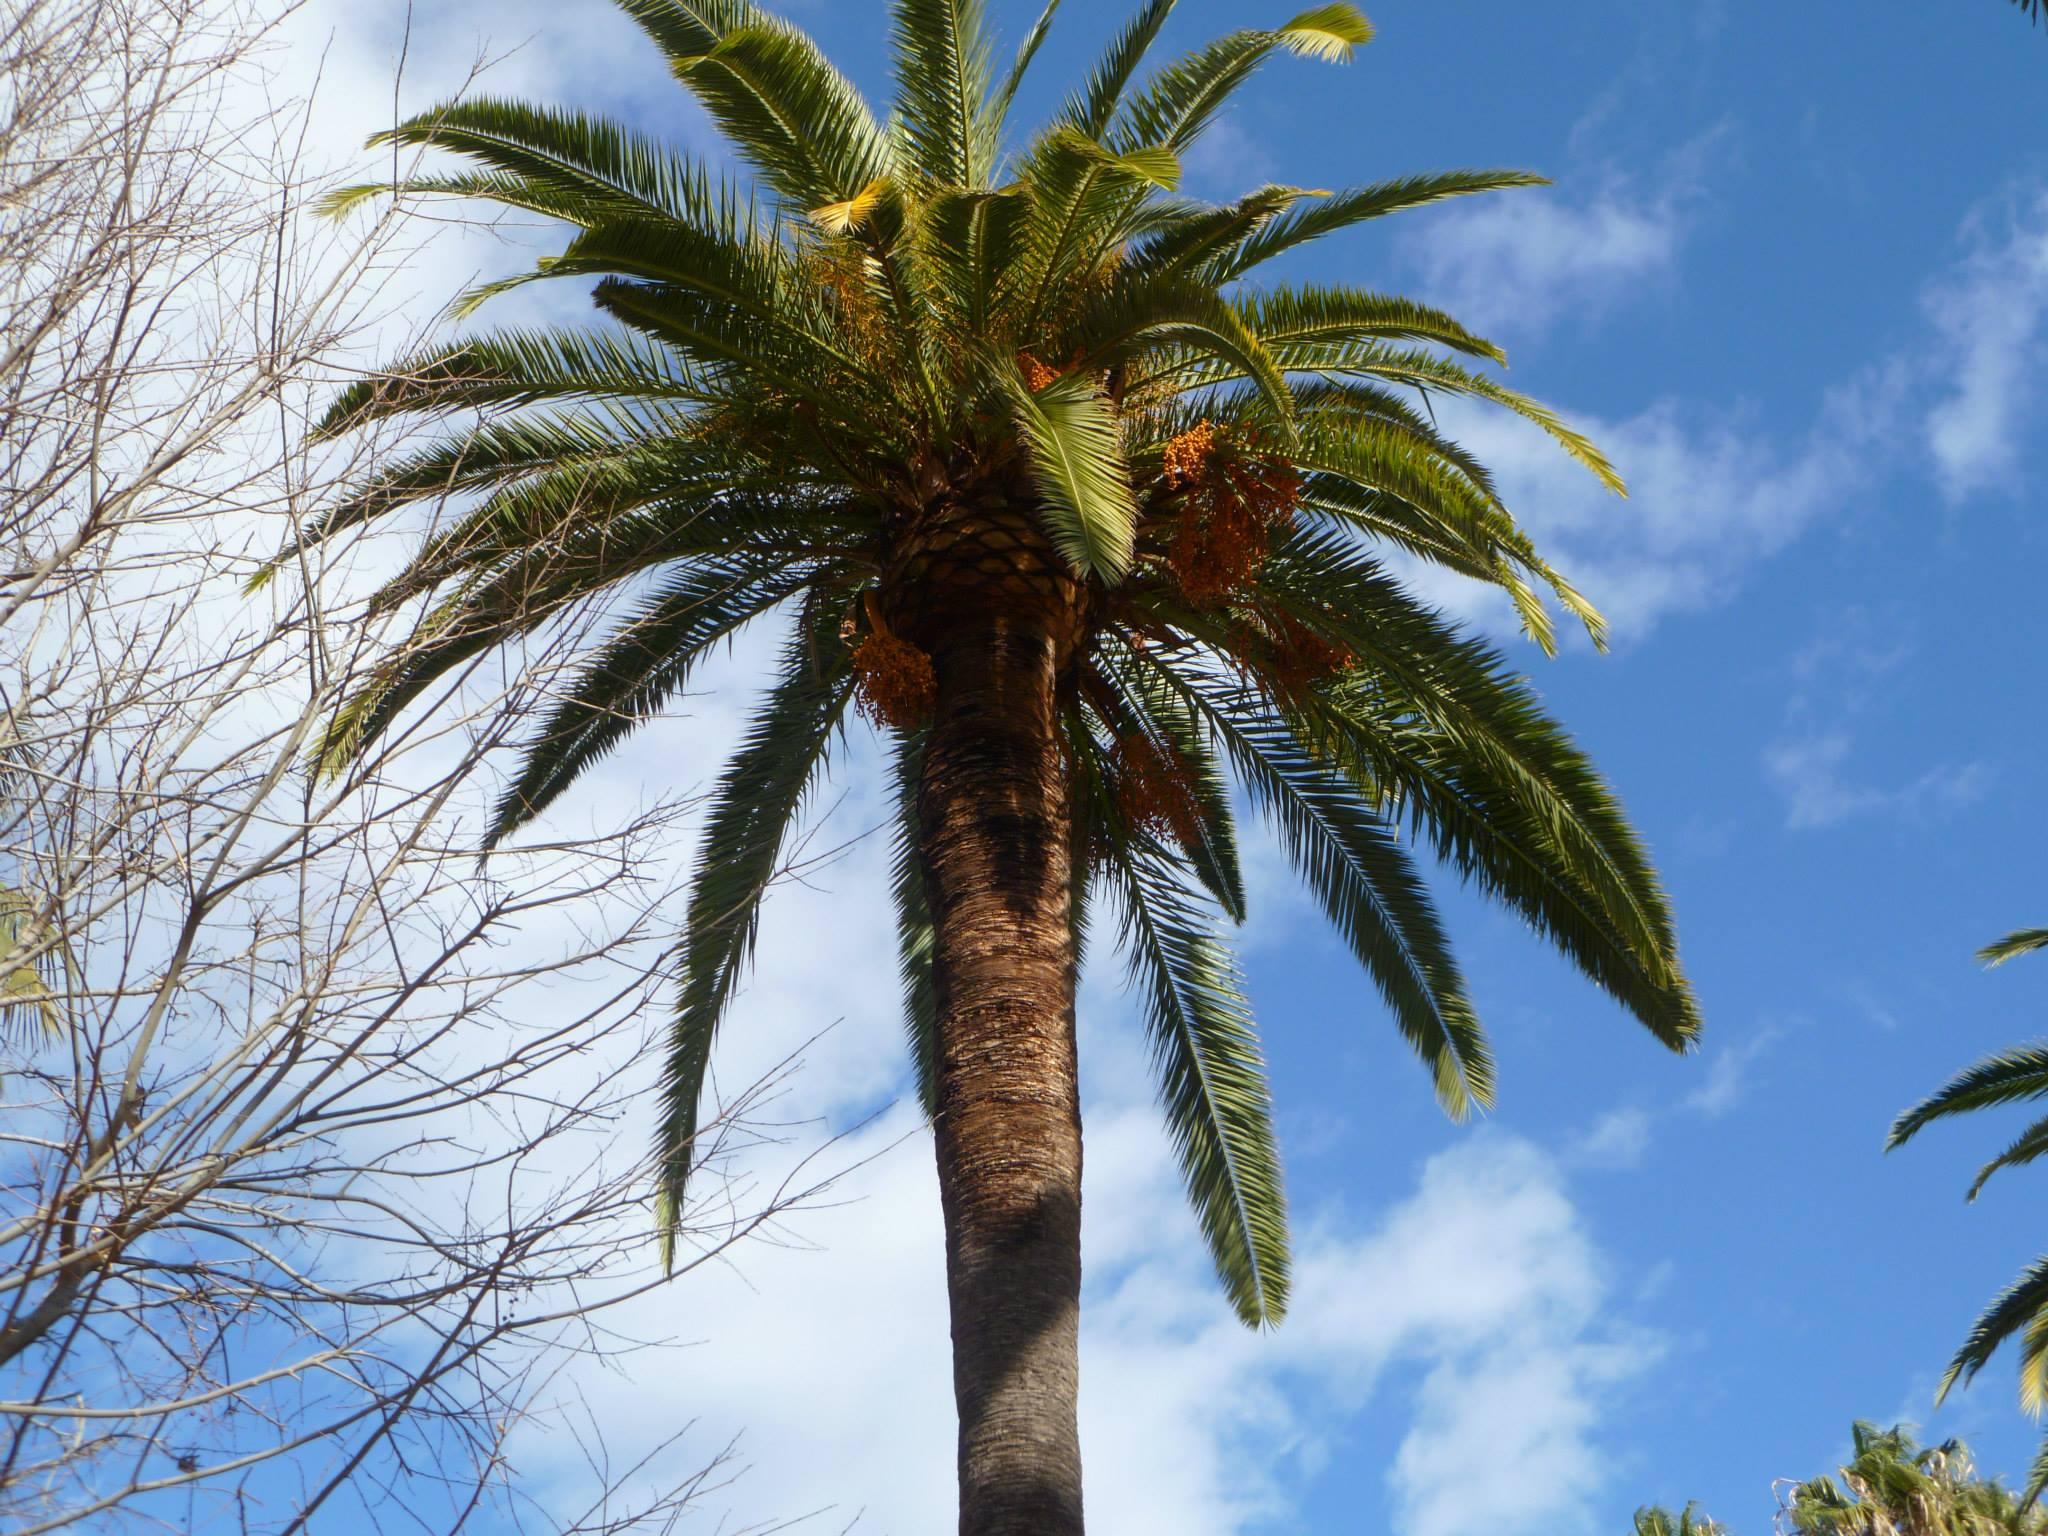 Malaga palm tree